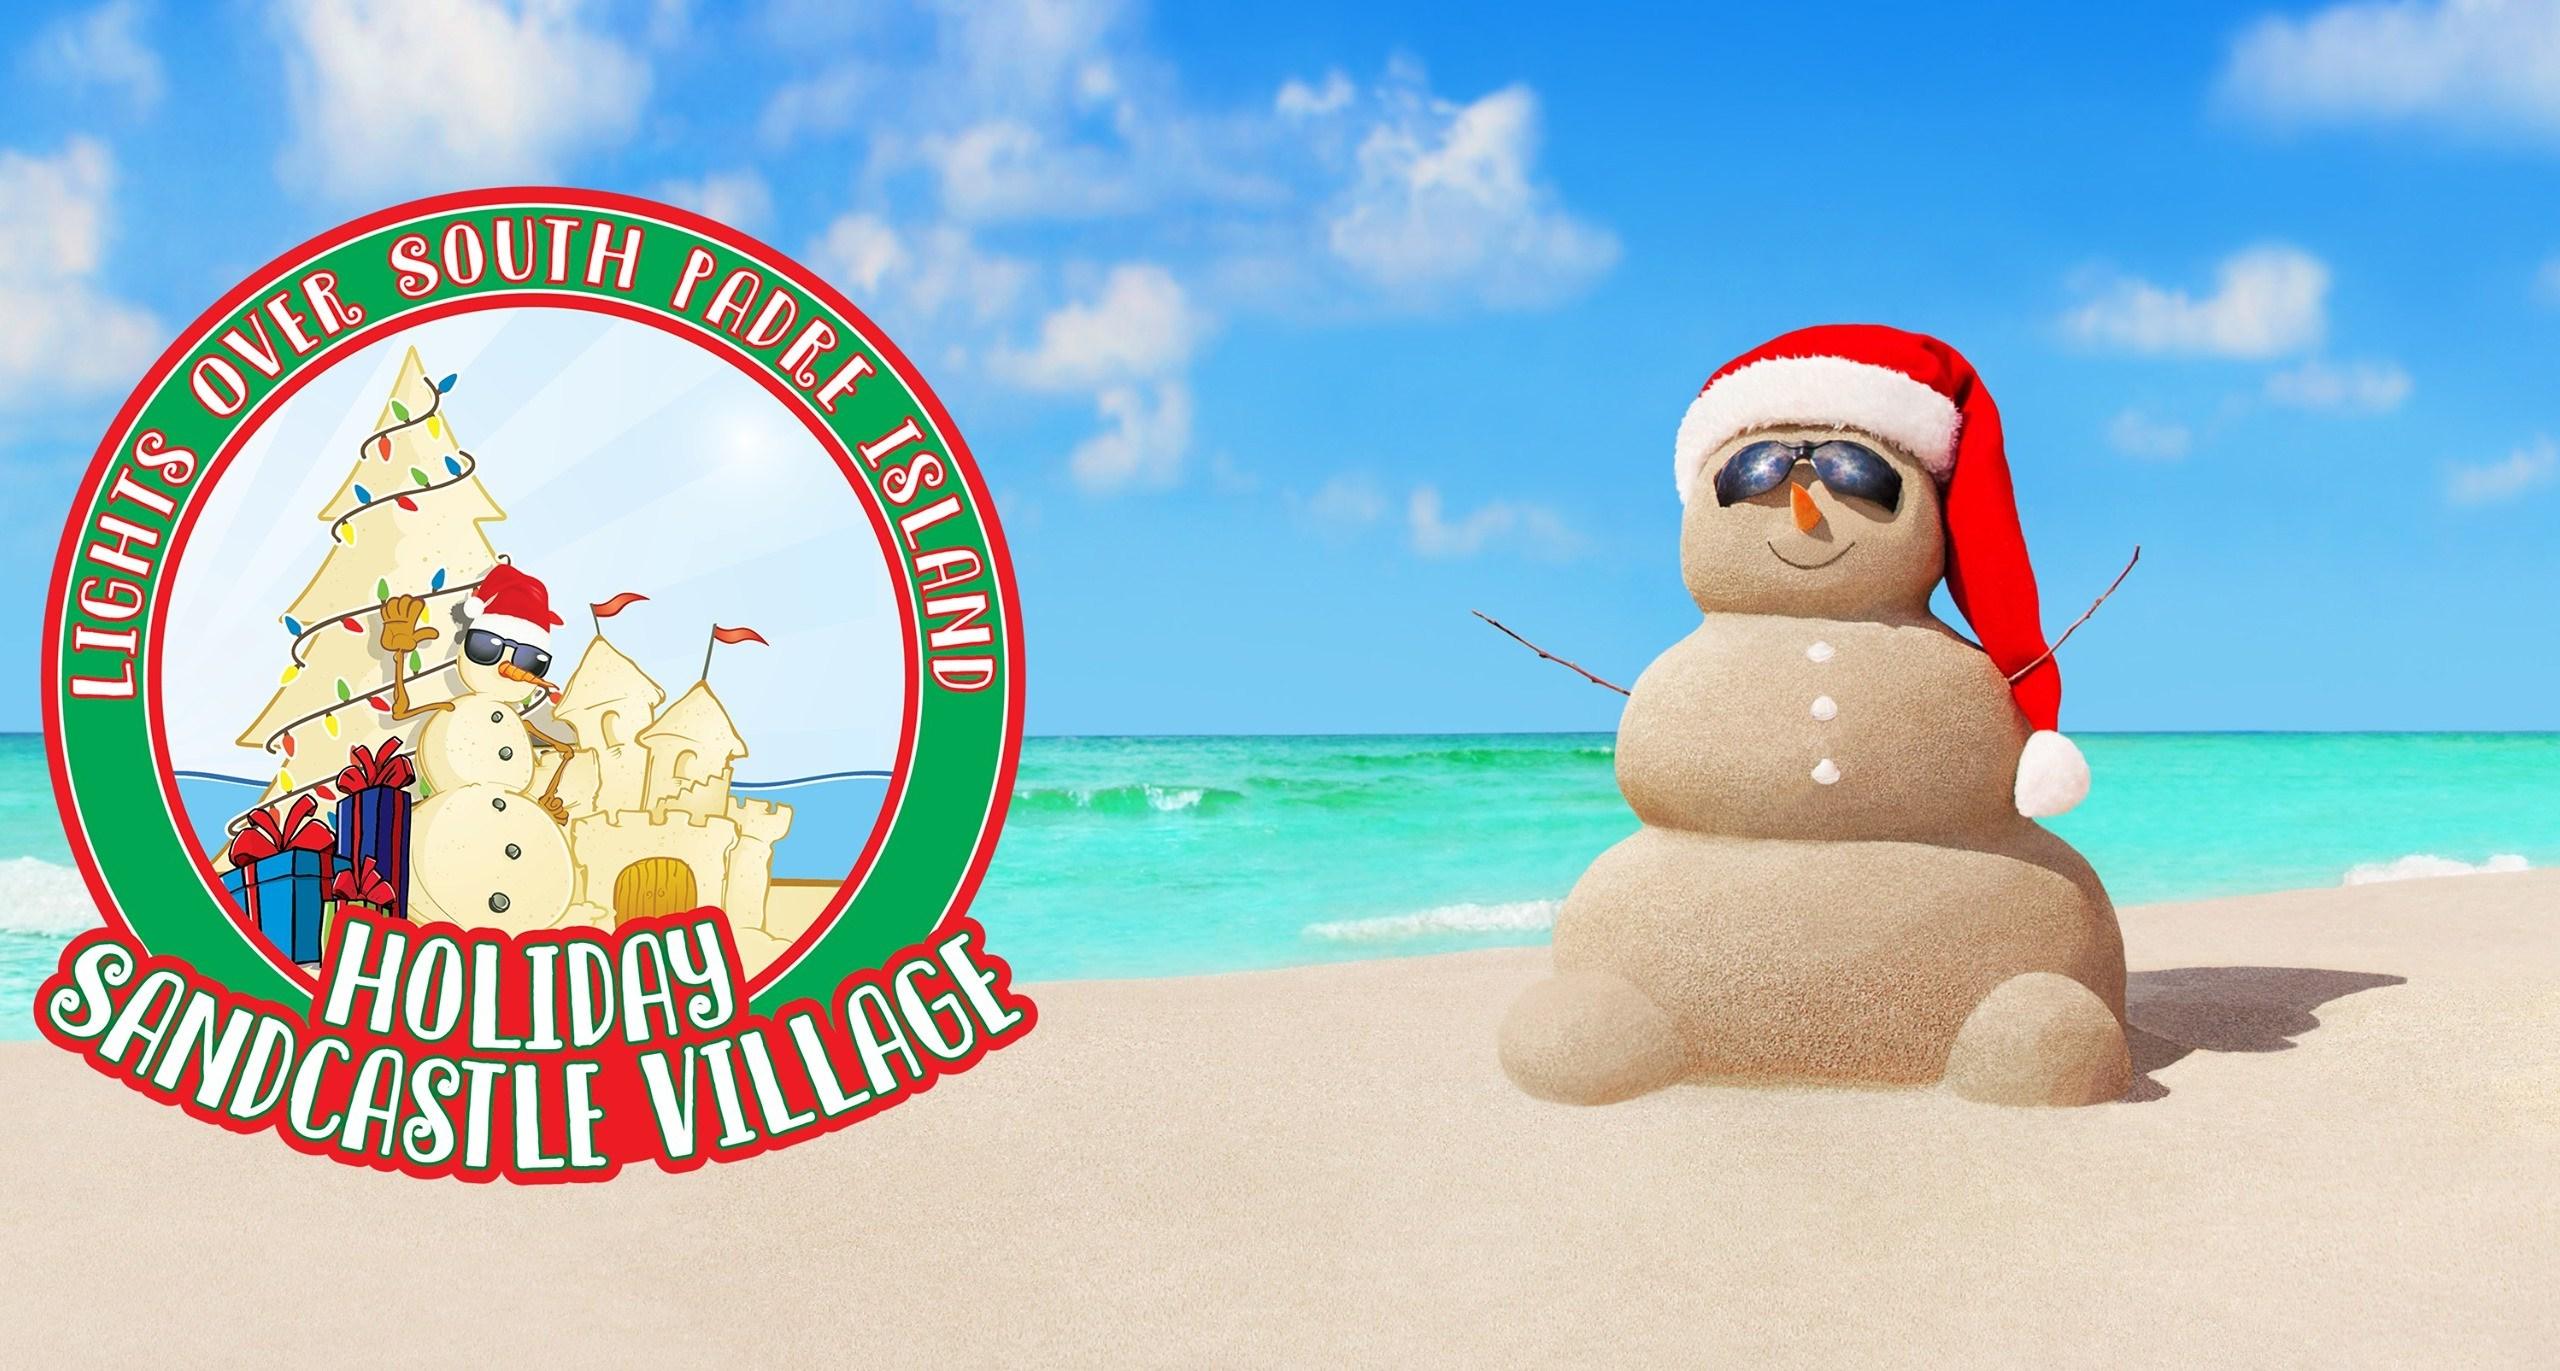 sandcastle village.jpg